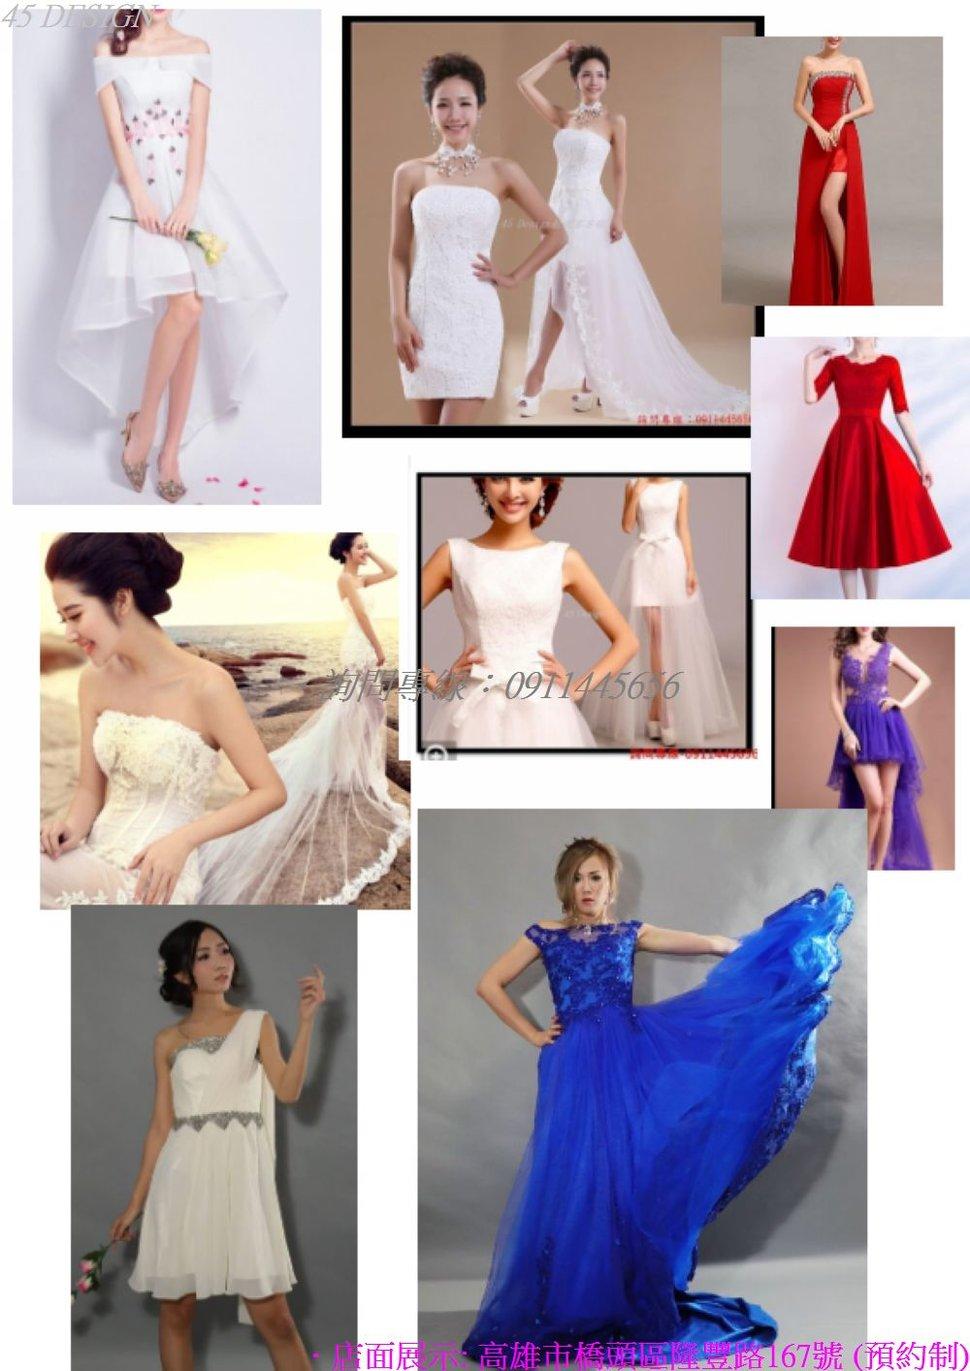 msl190815D1C0971F6FE14347842B8EC12CFD1368 - 全台最便宜-45DESIGN四五婚紗禮服《結婚吧》